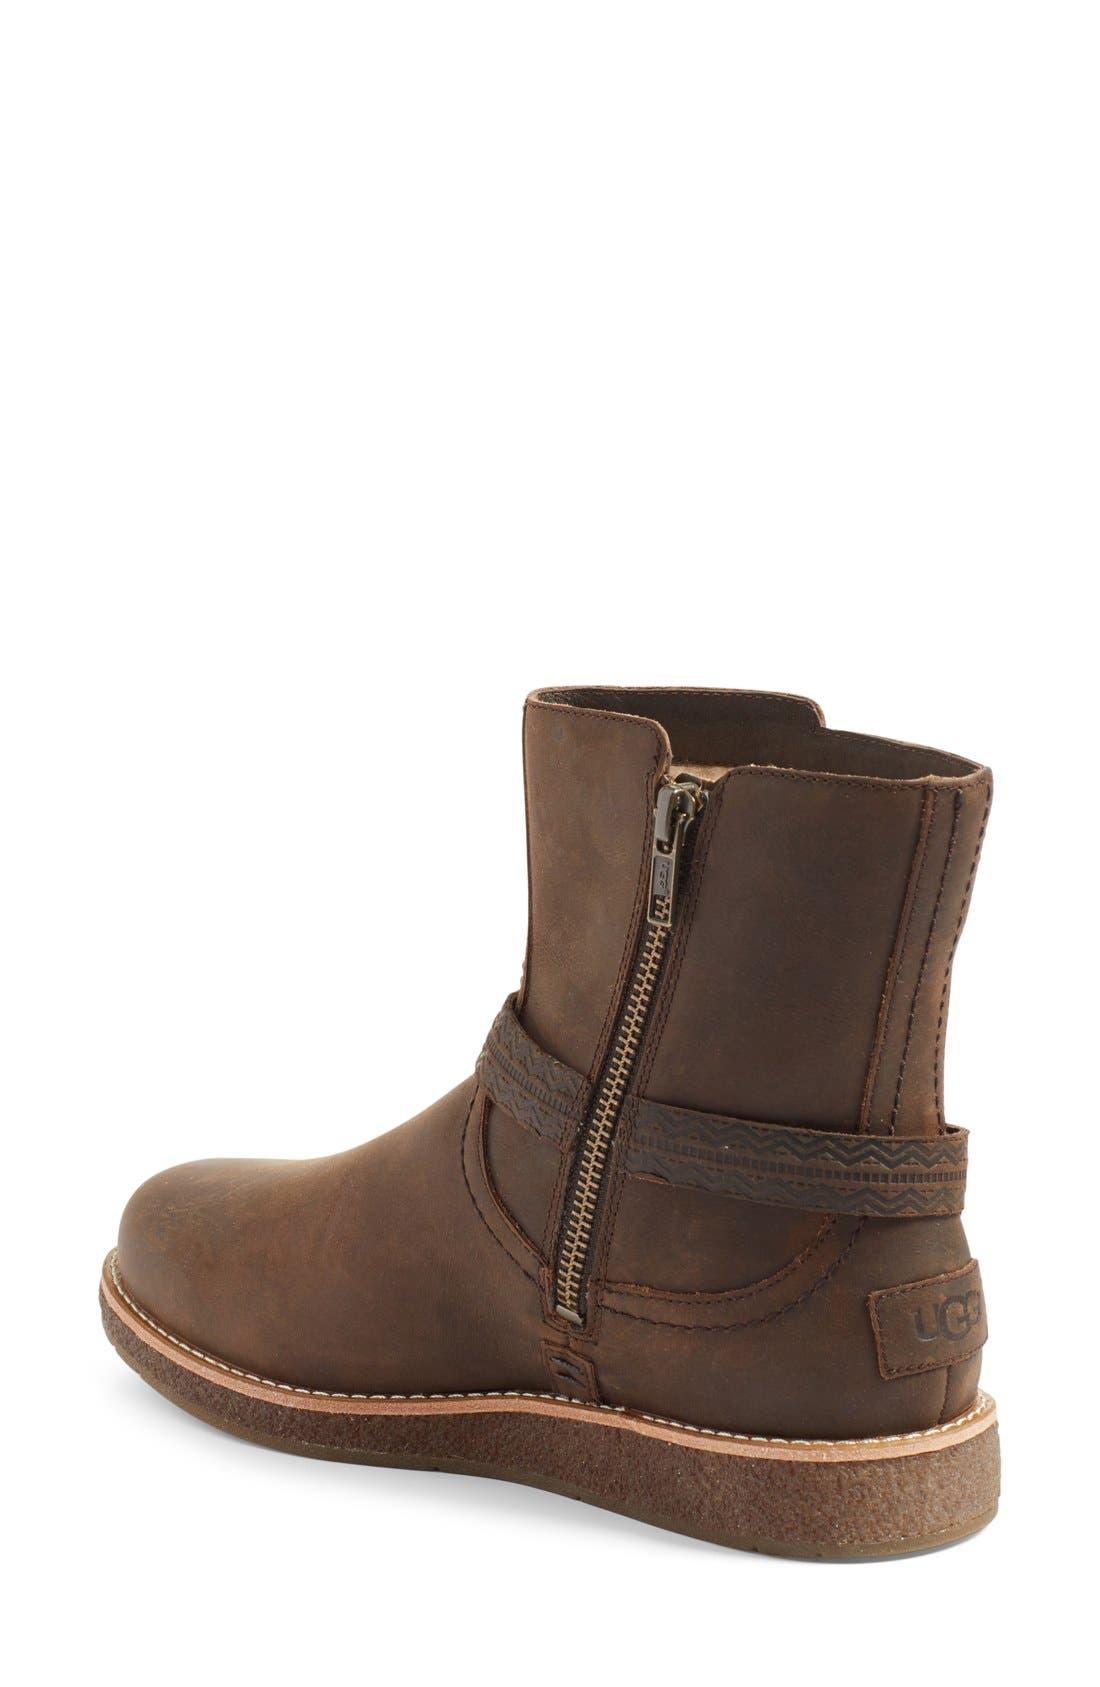 Alternate Image 2  - UGG® 'Camren' Boot (Women)